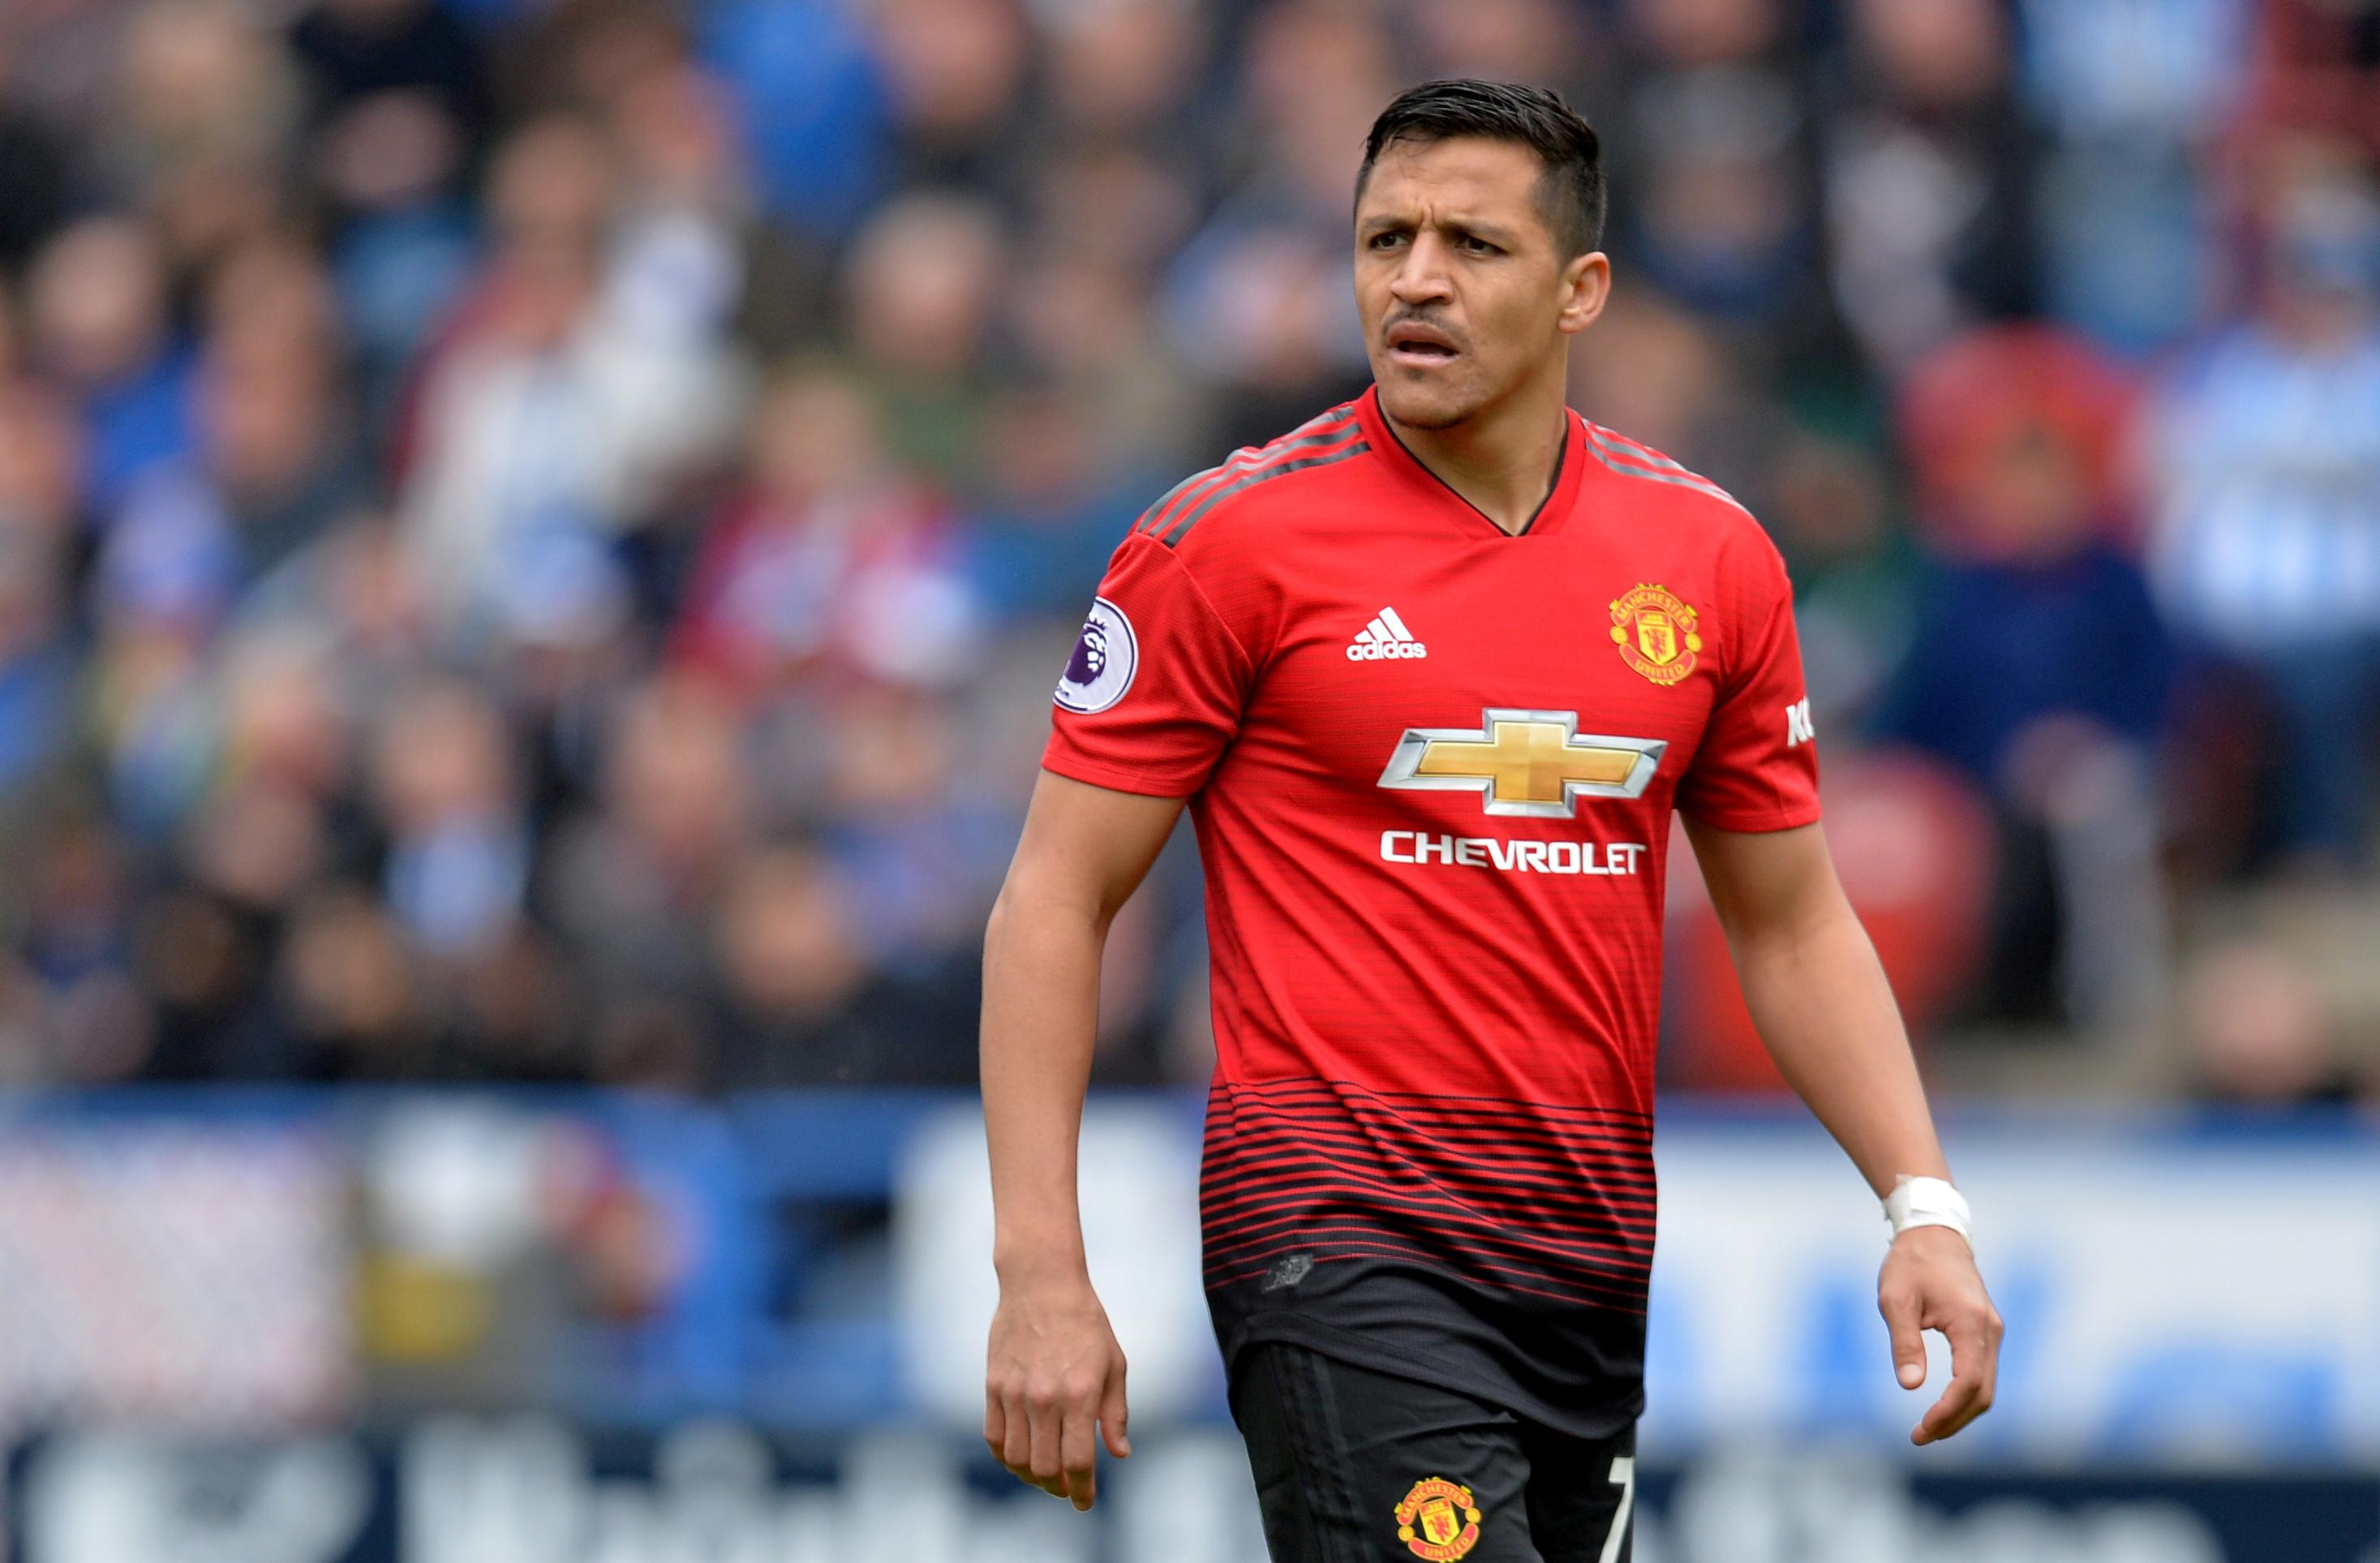 Alexis Sanchez เข้าร่วม United หลังจากใช้เวลาสี่ปีกับ Arsenal